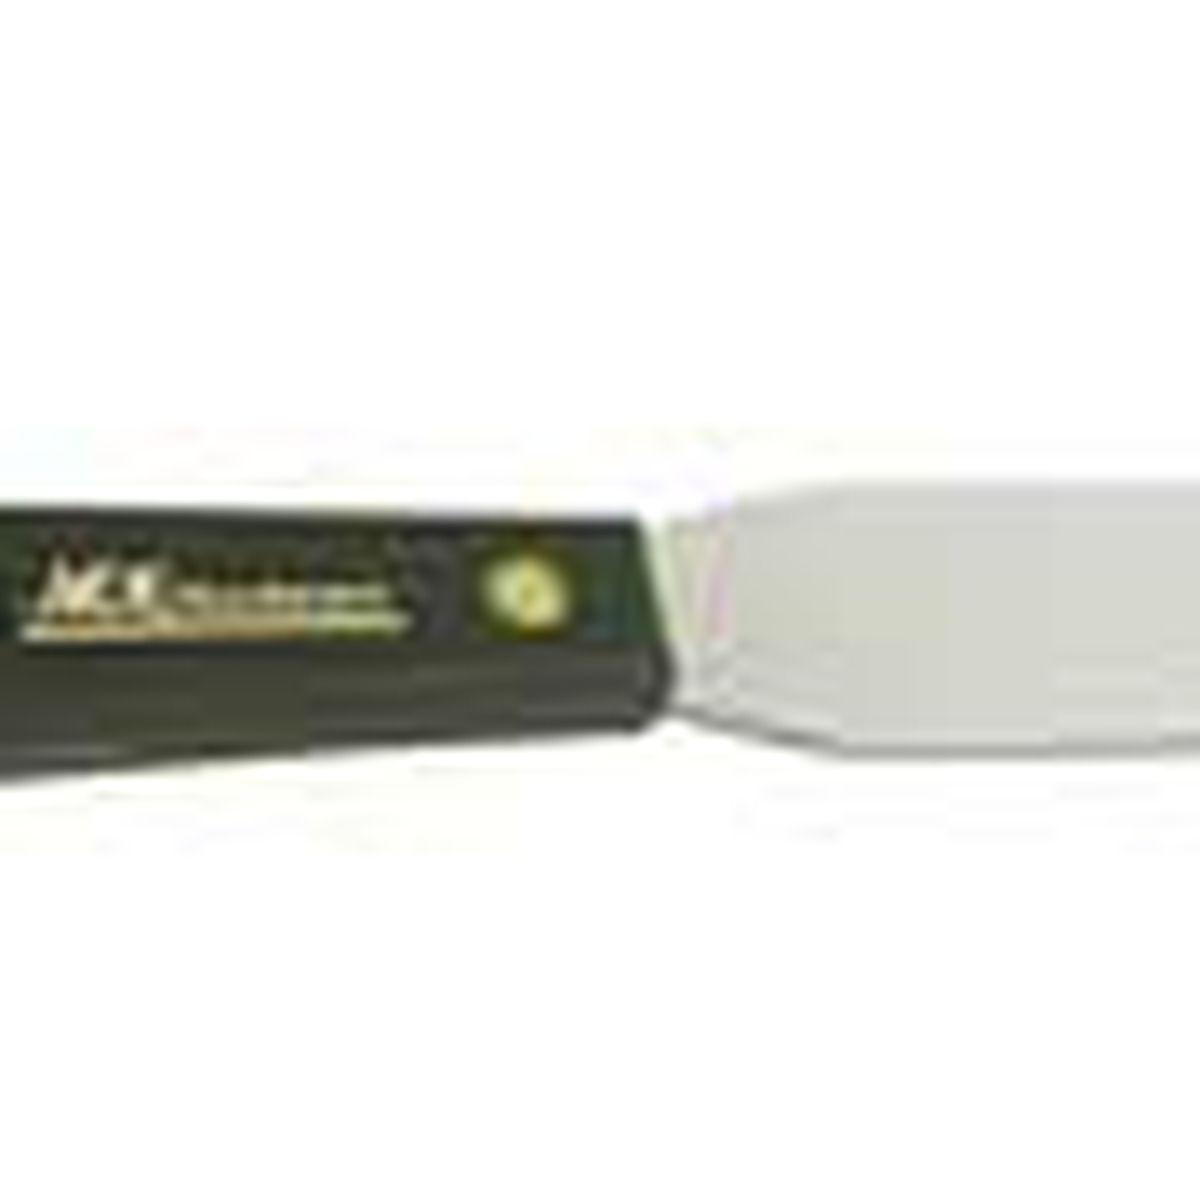 putty knife